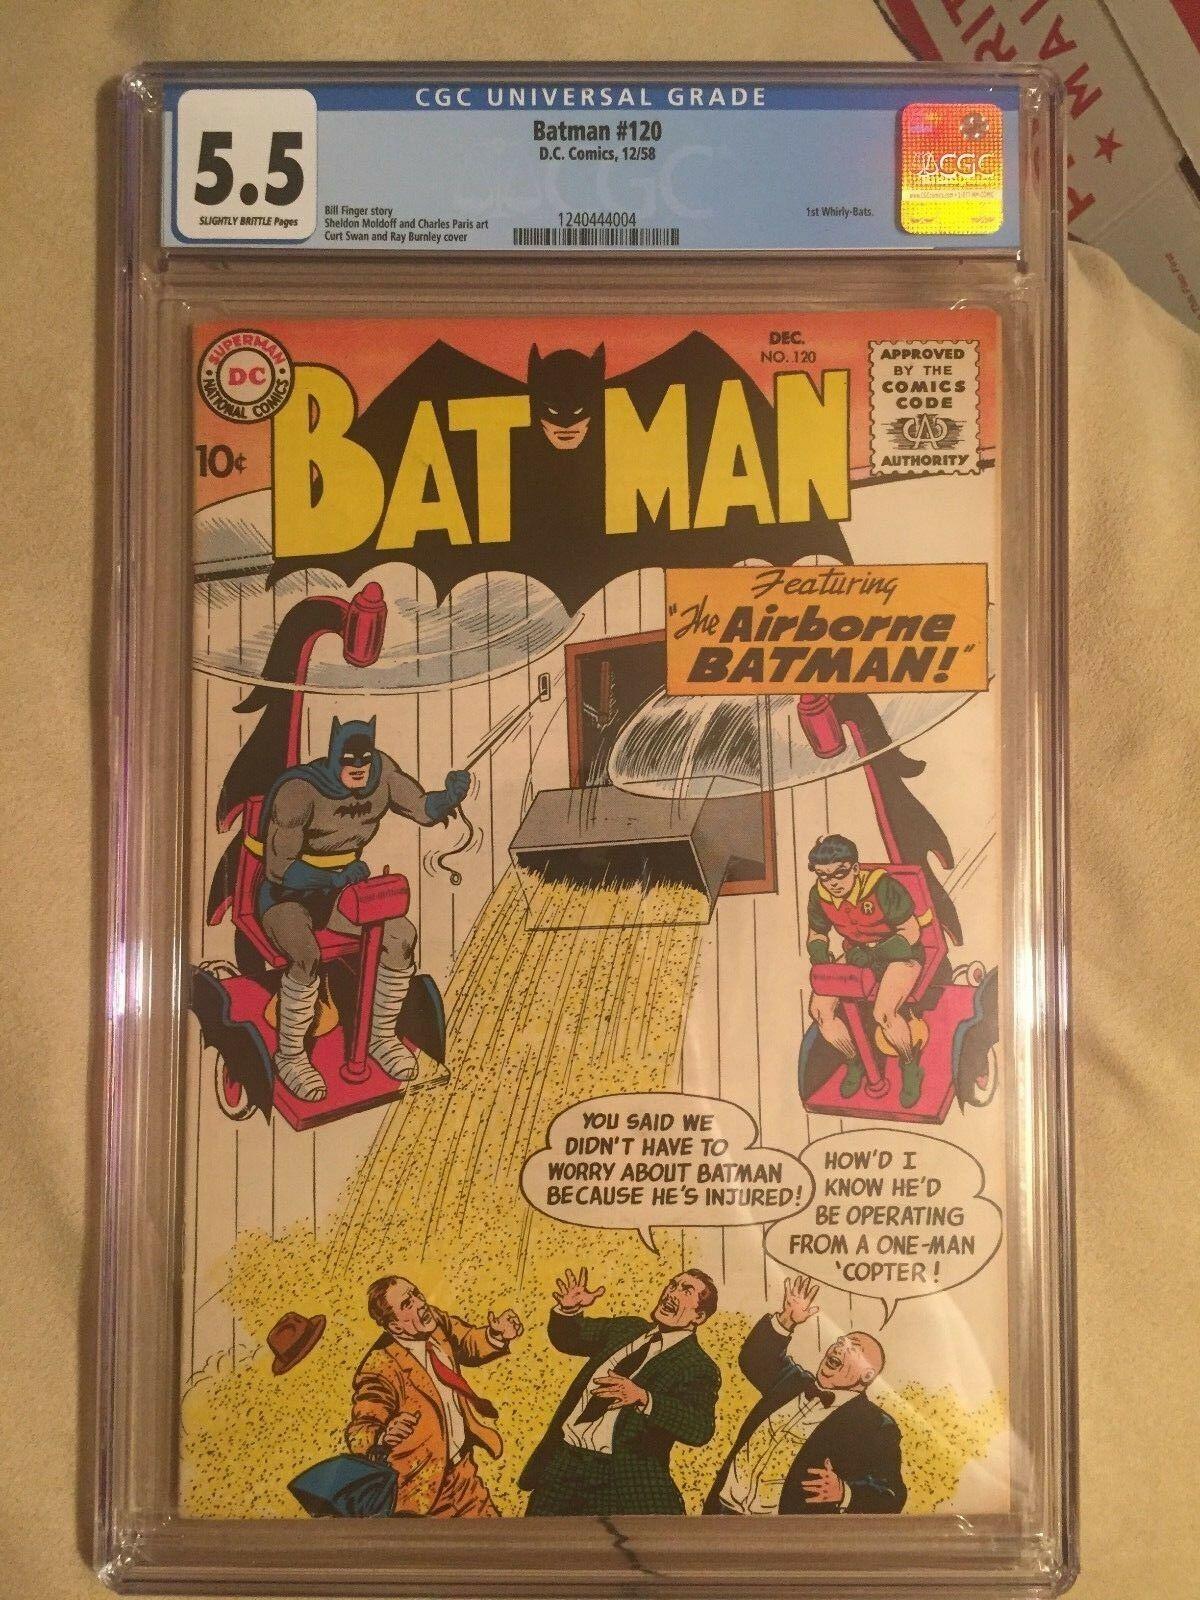 Batman #120 DC Comics 1958 1st Whirly-Bats CGC Graded 5.5